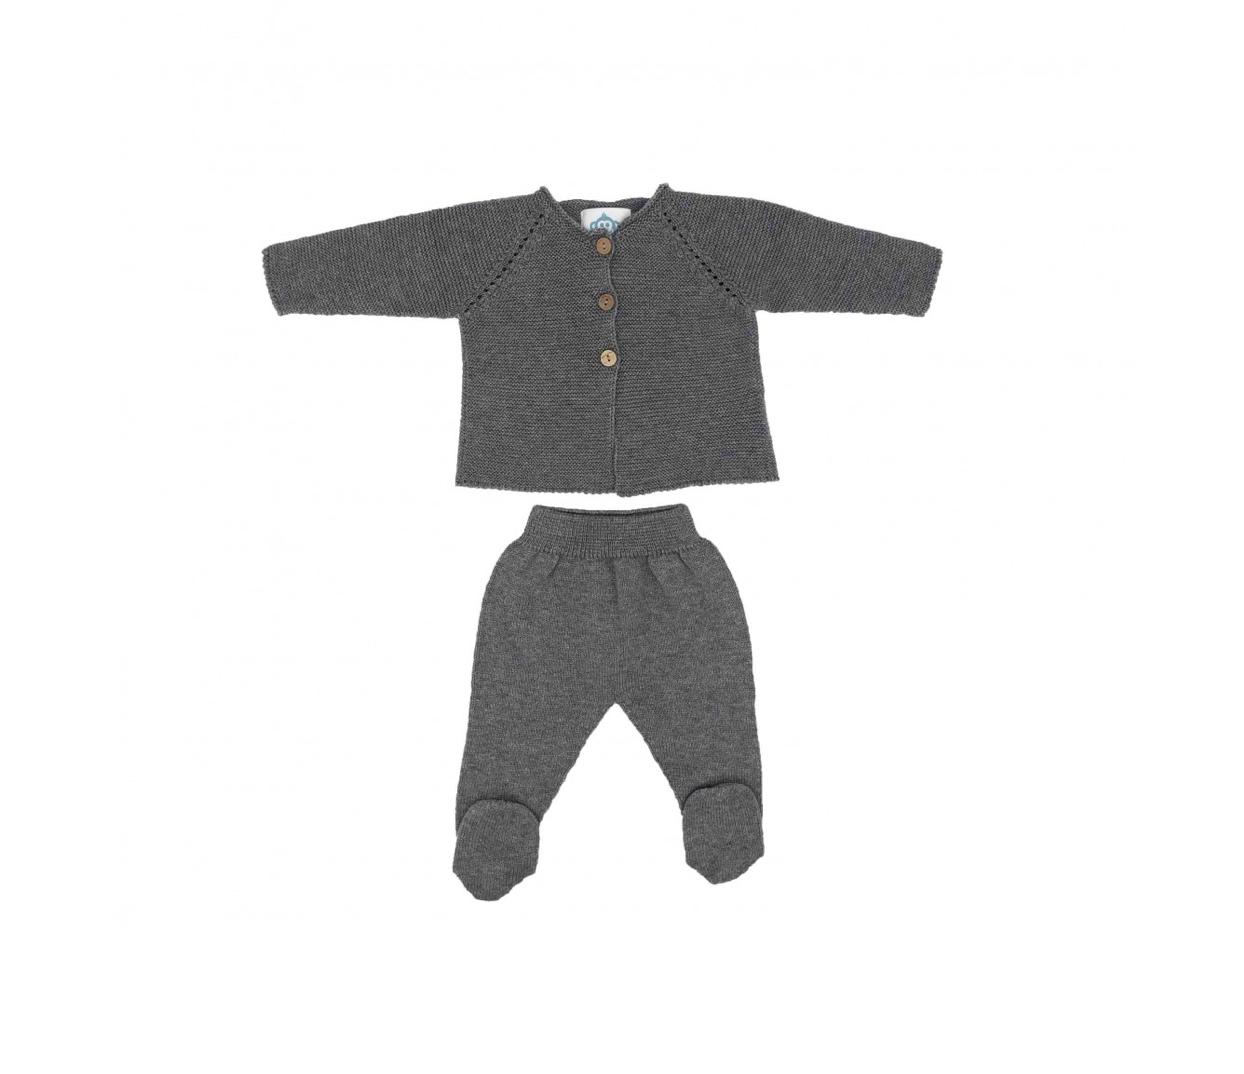 Newborn Set - Grey